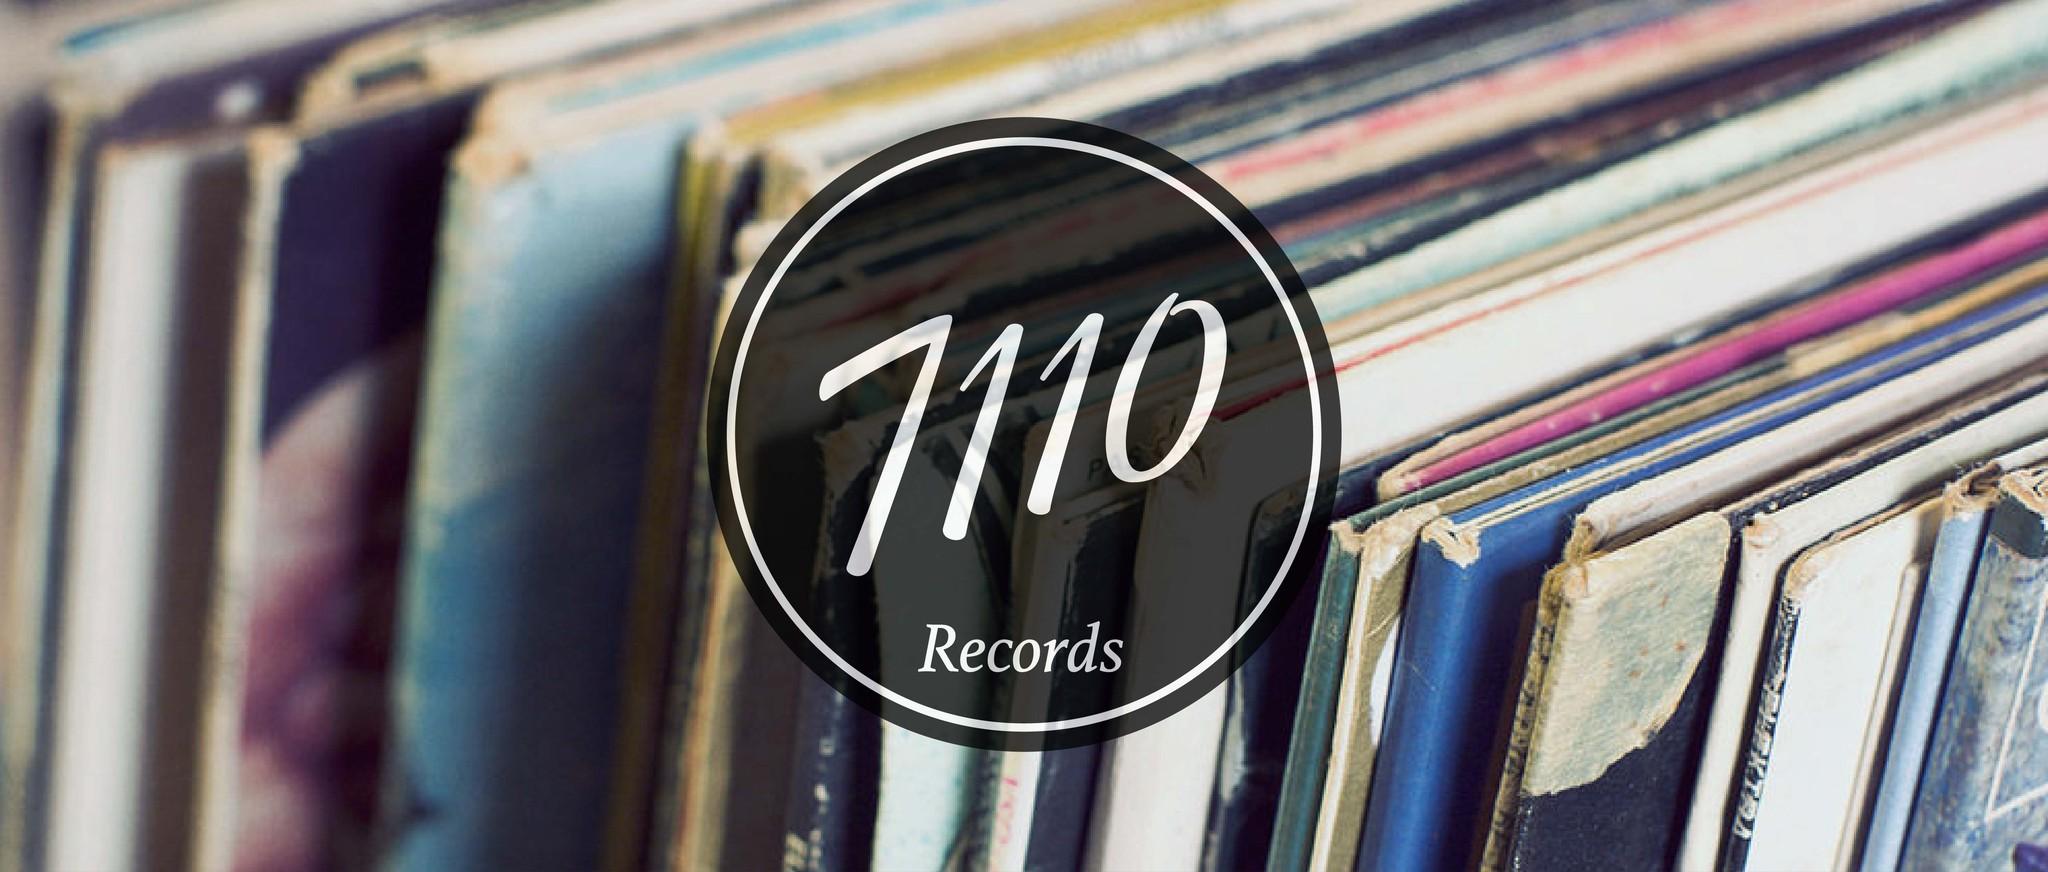 7110 Records リニューアル OPEN !!